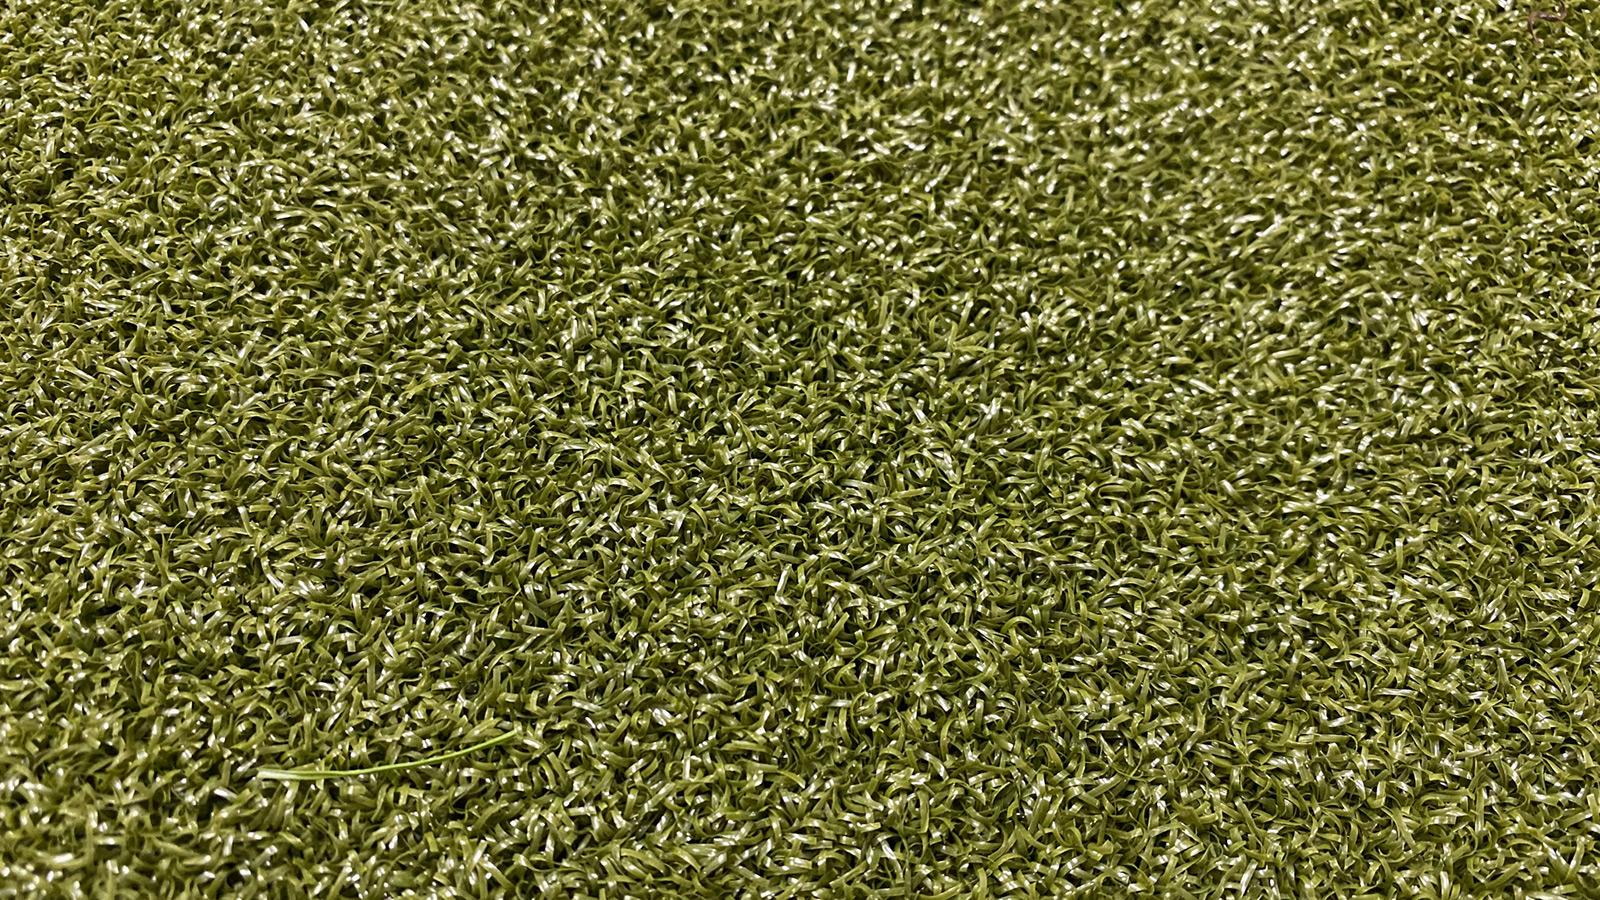 Putt Nylon Top | Artificial Grass | Eco-Friendly Turf Flooring | The Inside Track